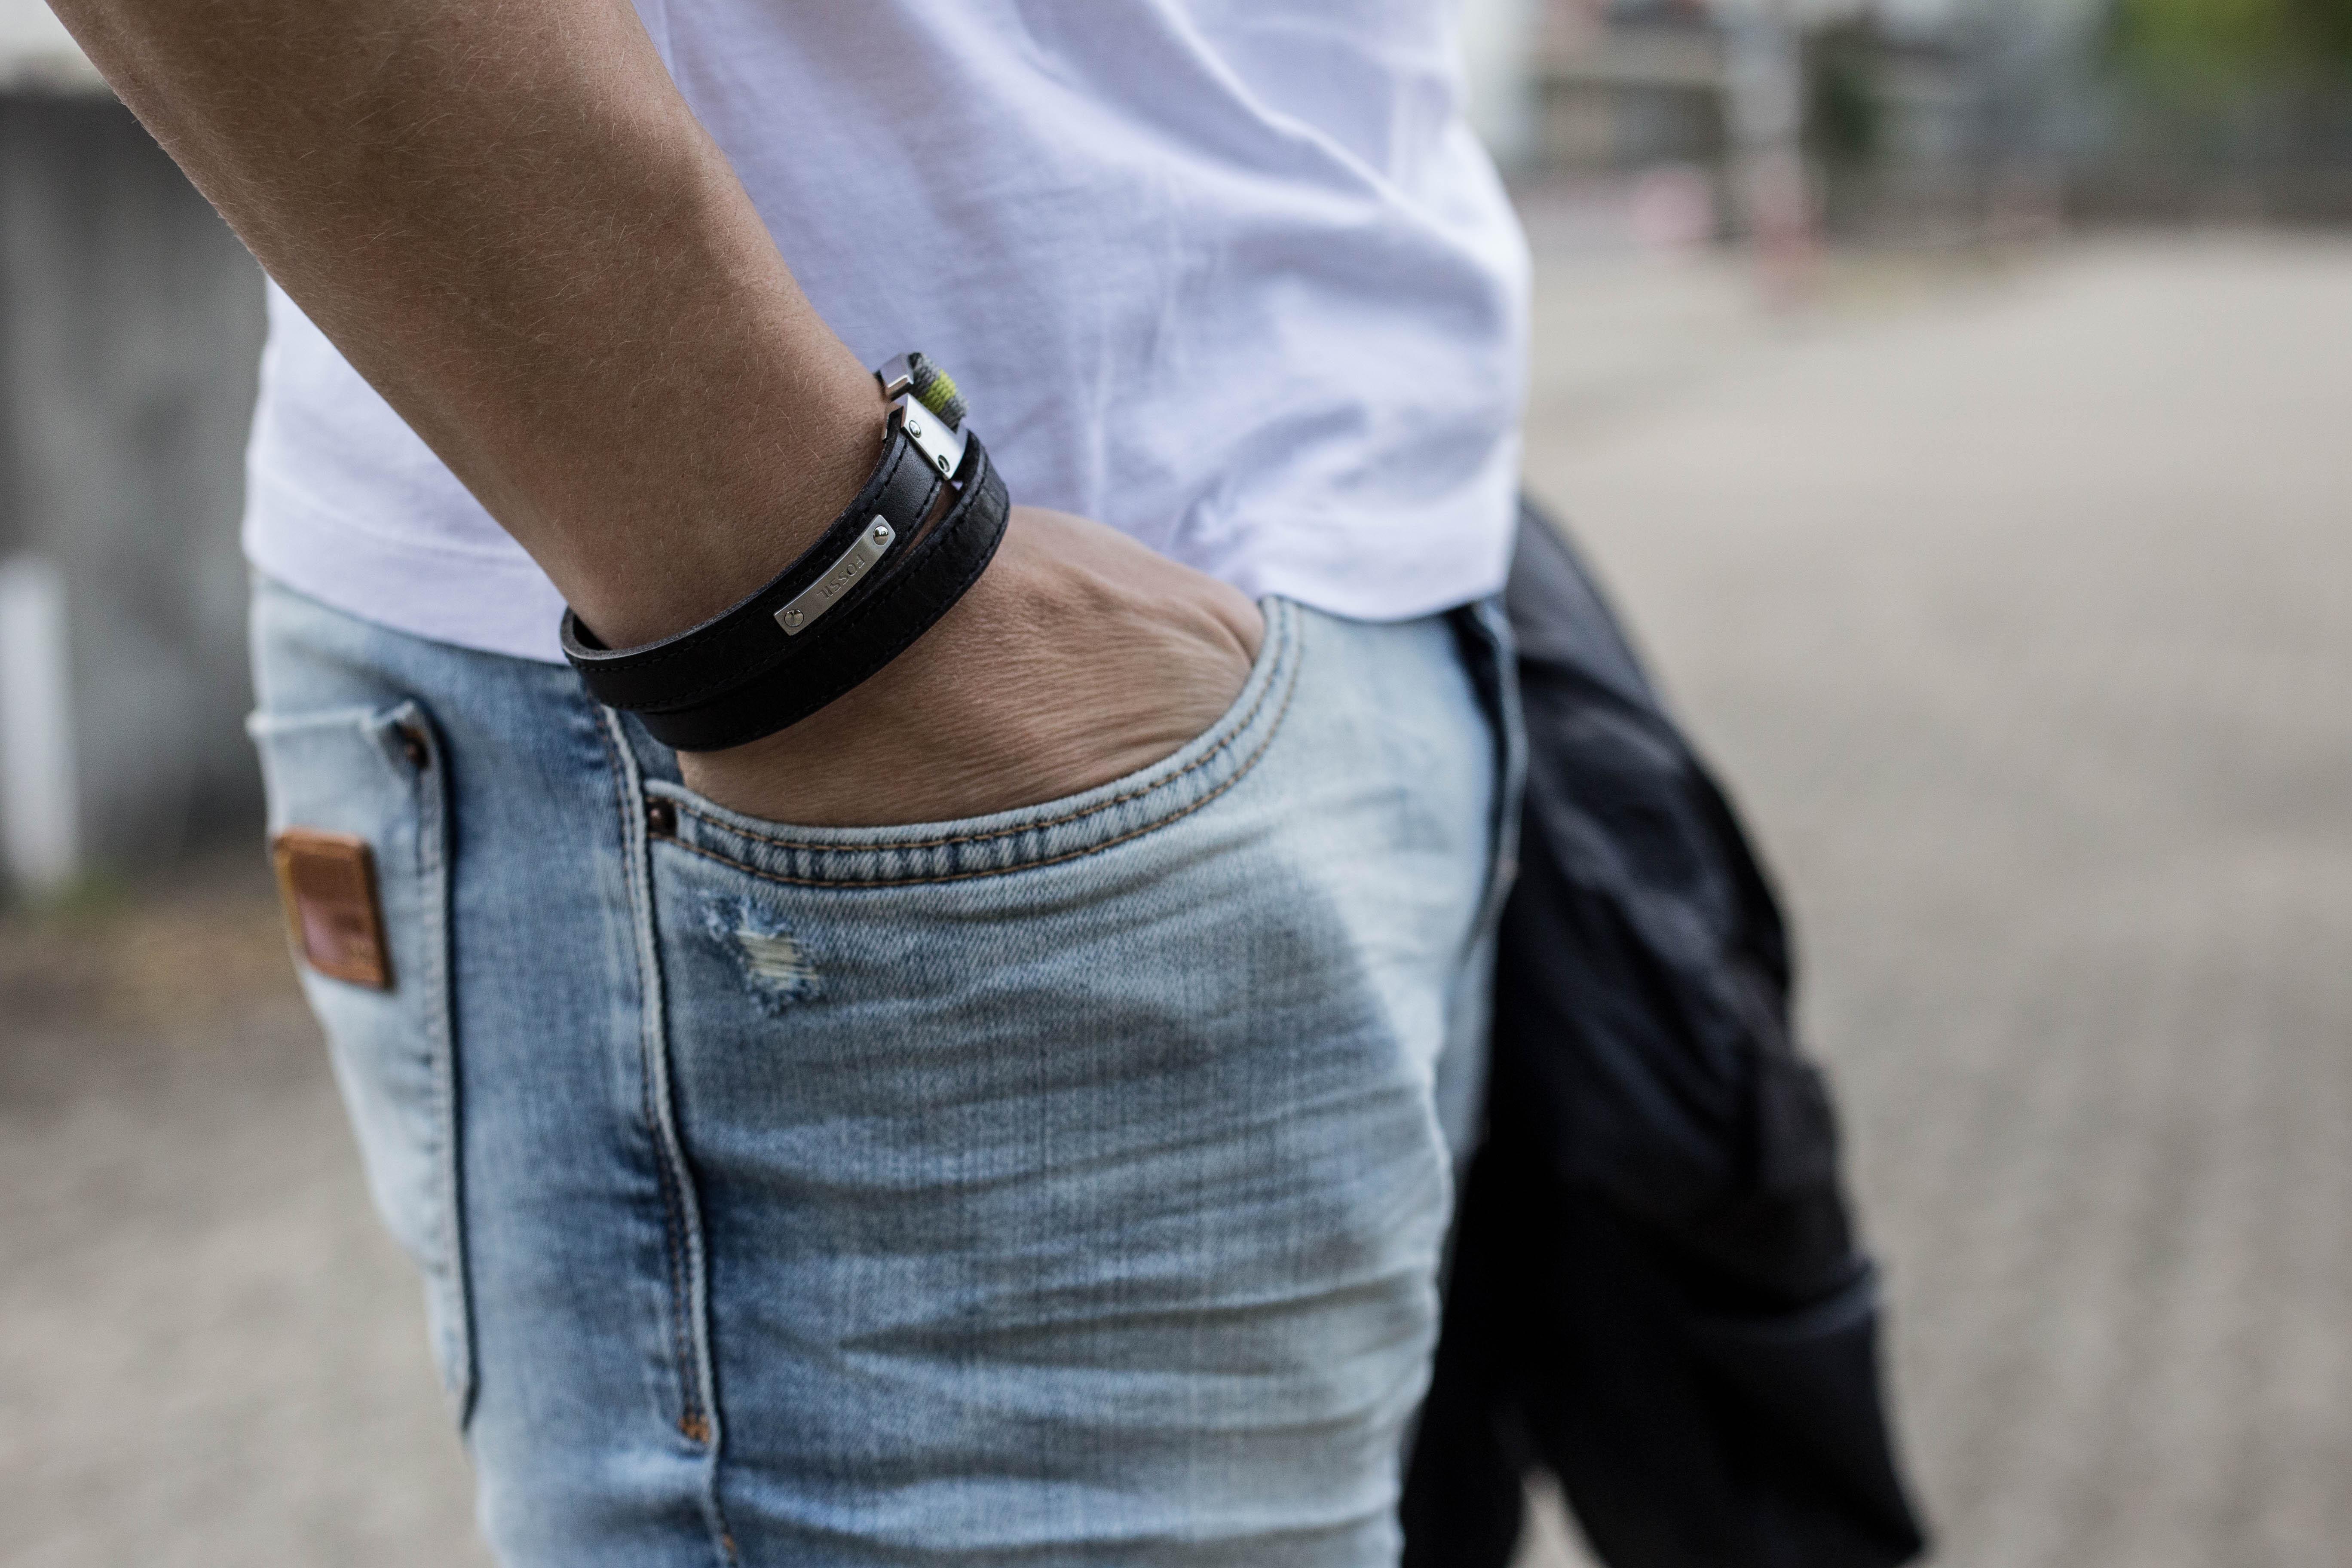 diesel-shirt-fashionlook-menfashion-männerblog-berlin-outfit_6803